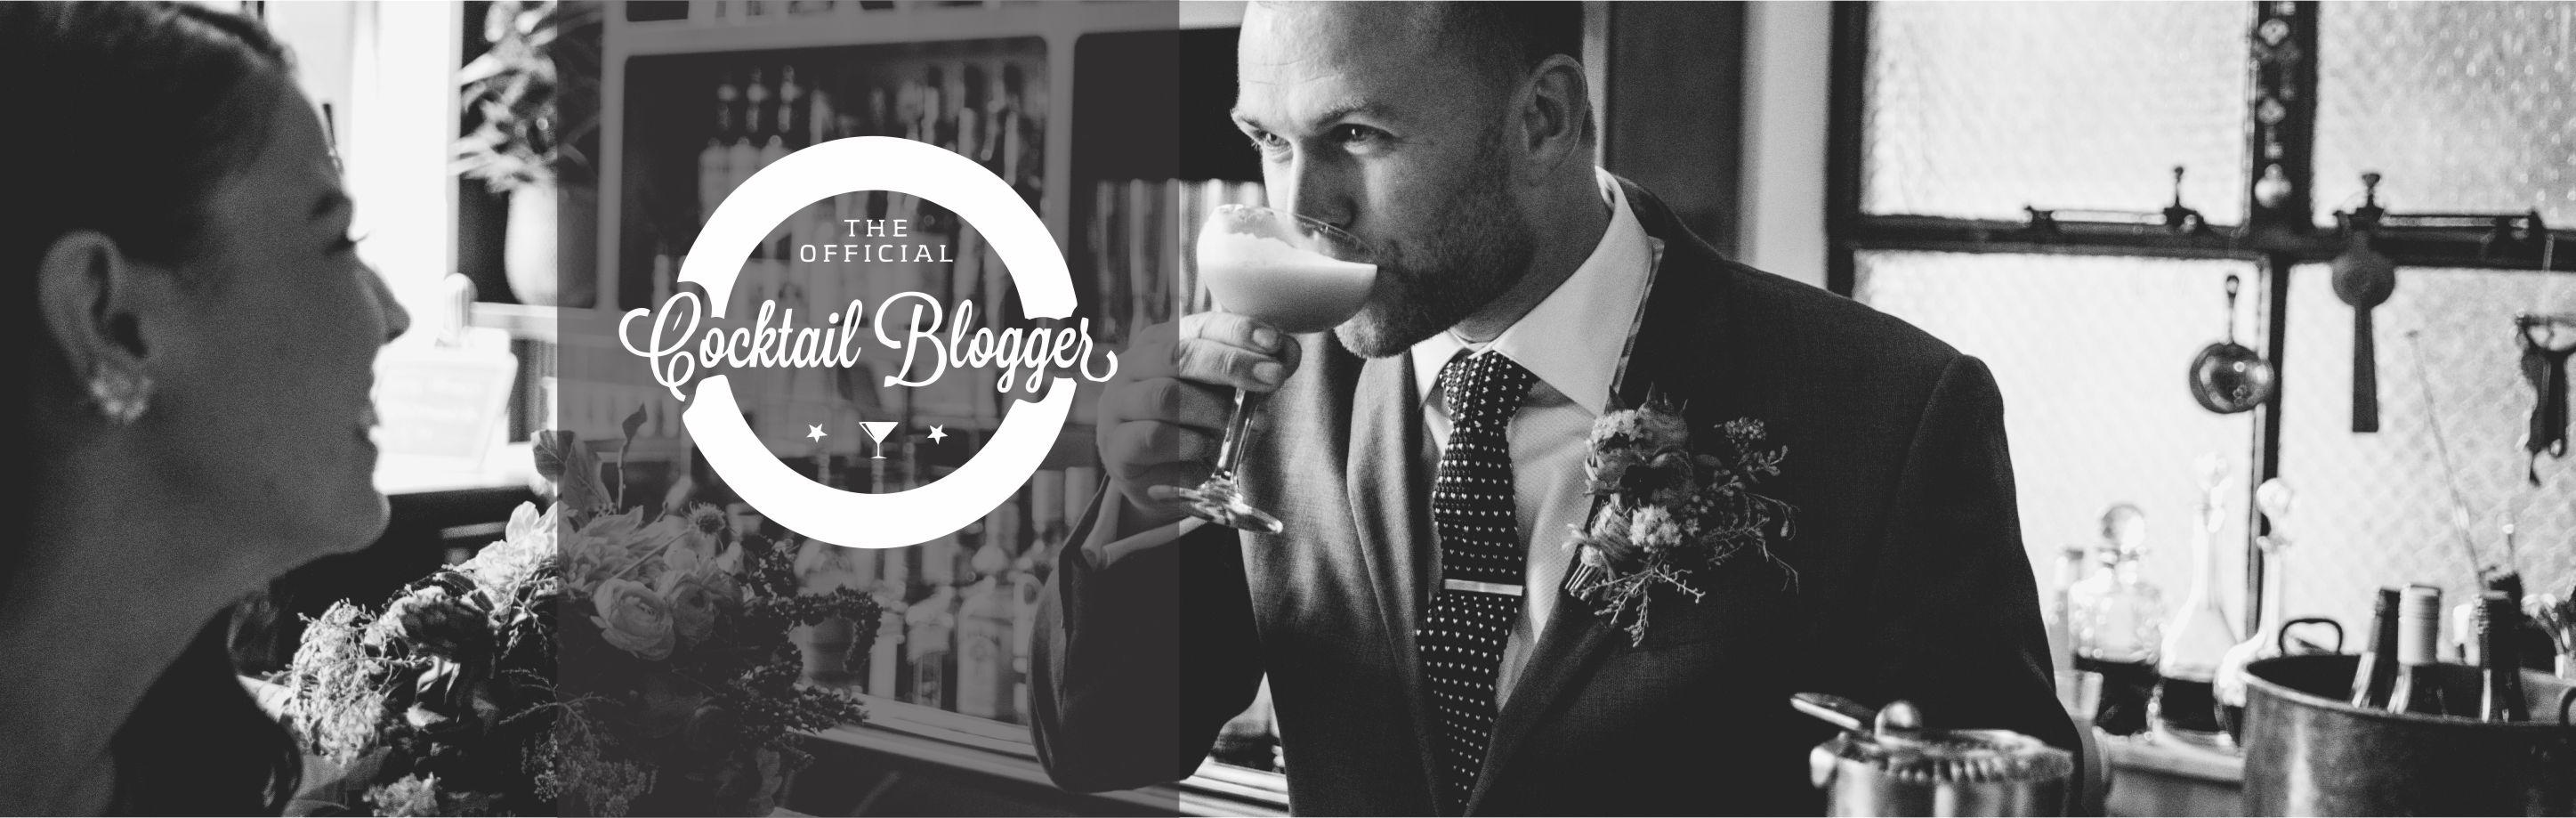 cocktailbloggerhomepagebanner